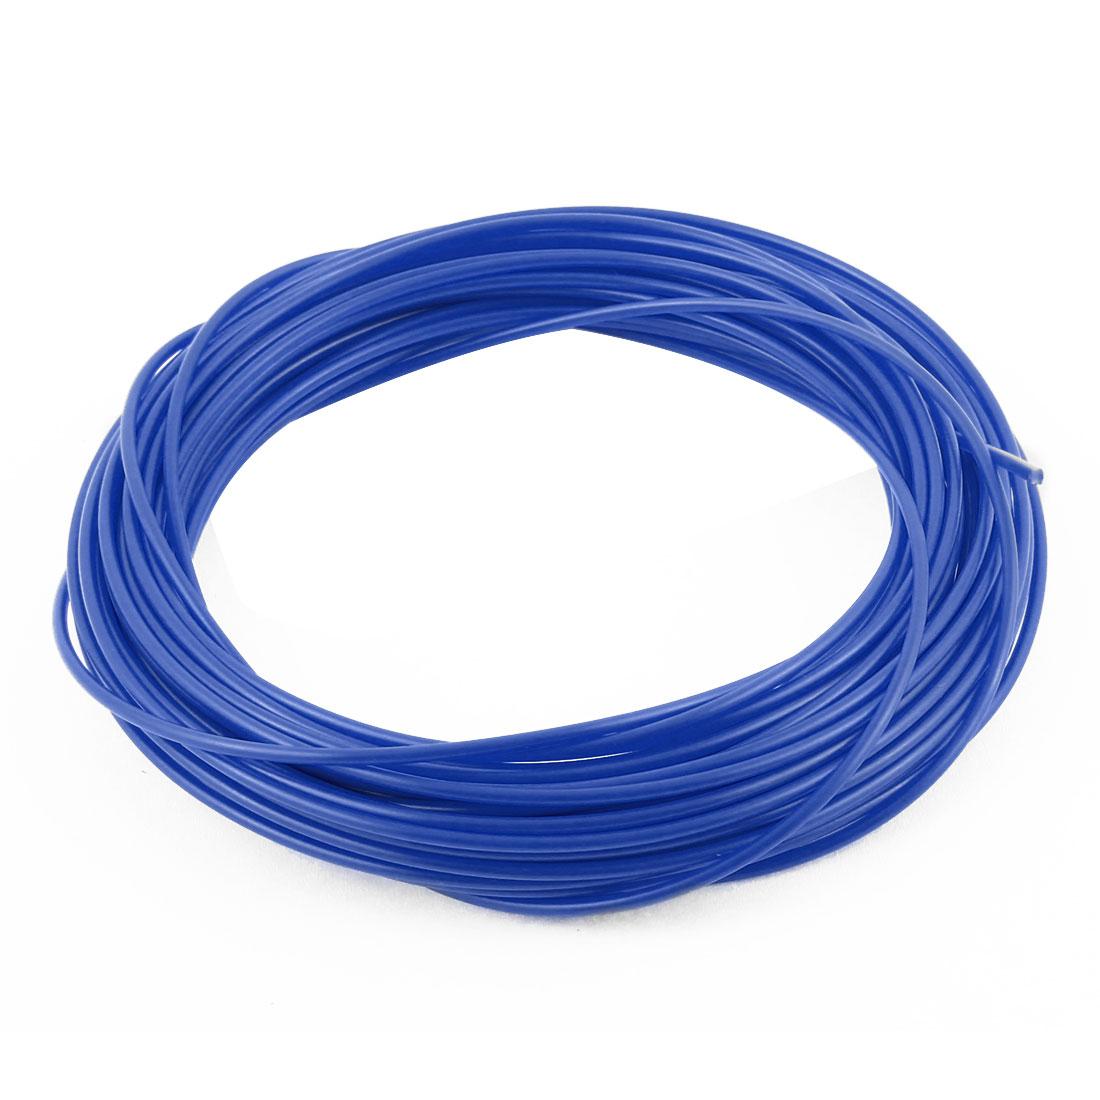 10m 3D Printer Pen Painting Filament Refills ABS Printing Material Blue